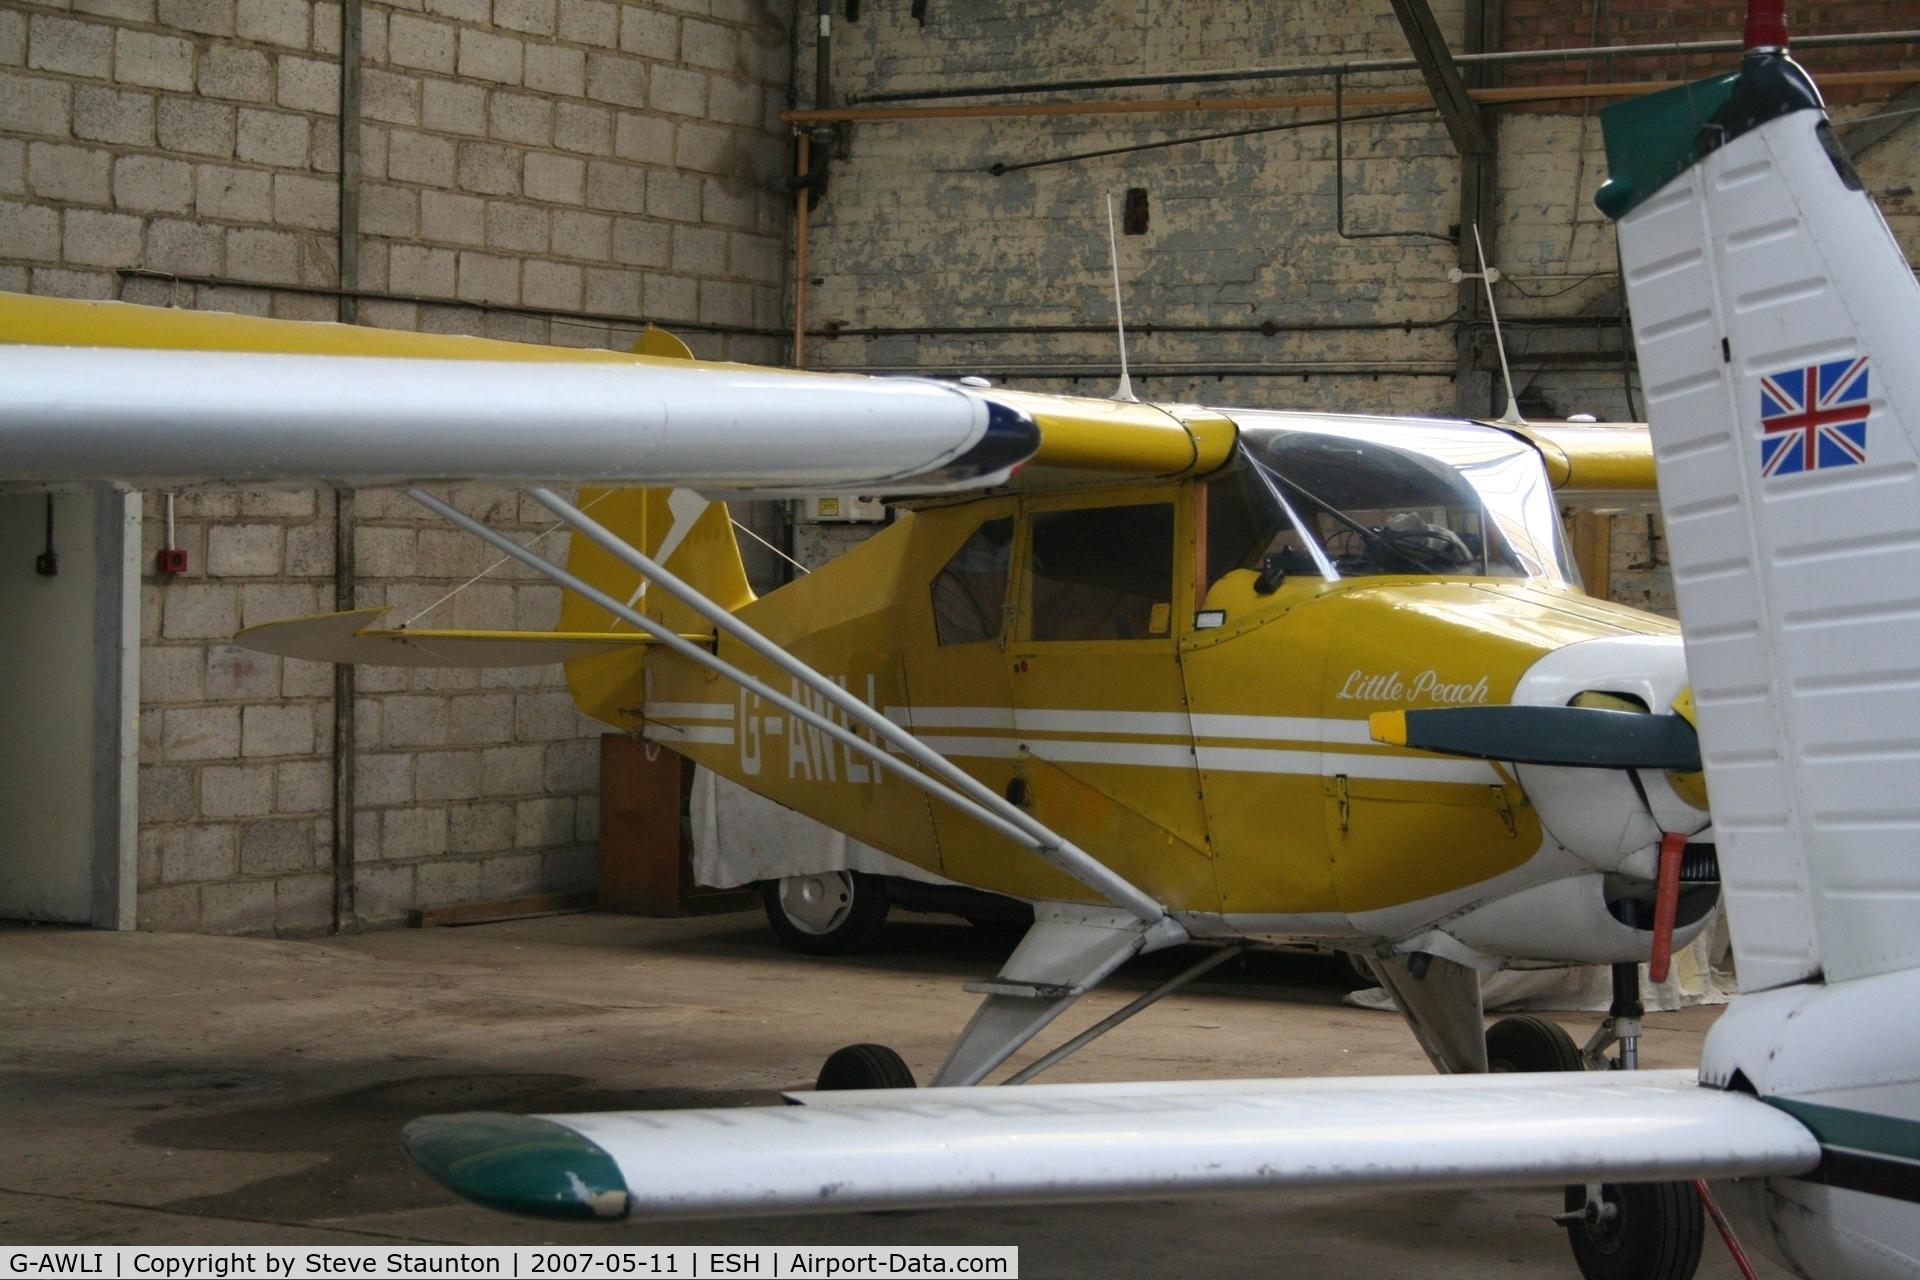 G-AWLI, 1957 Piper PA-22-150 Tri-Pacer C/N 22-5083, Taken on a recent base tour at Shoreham